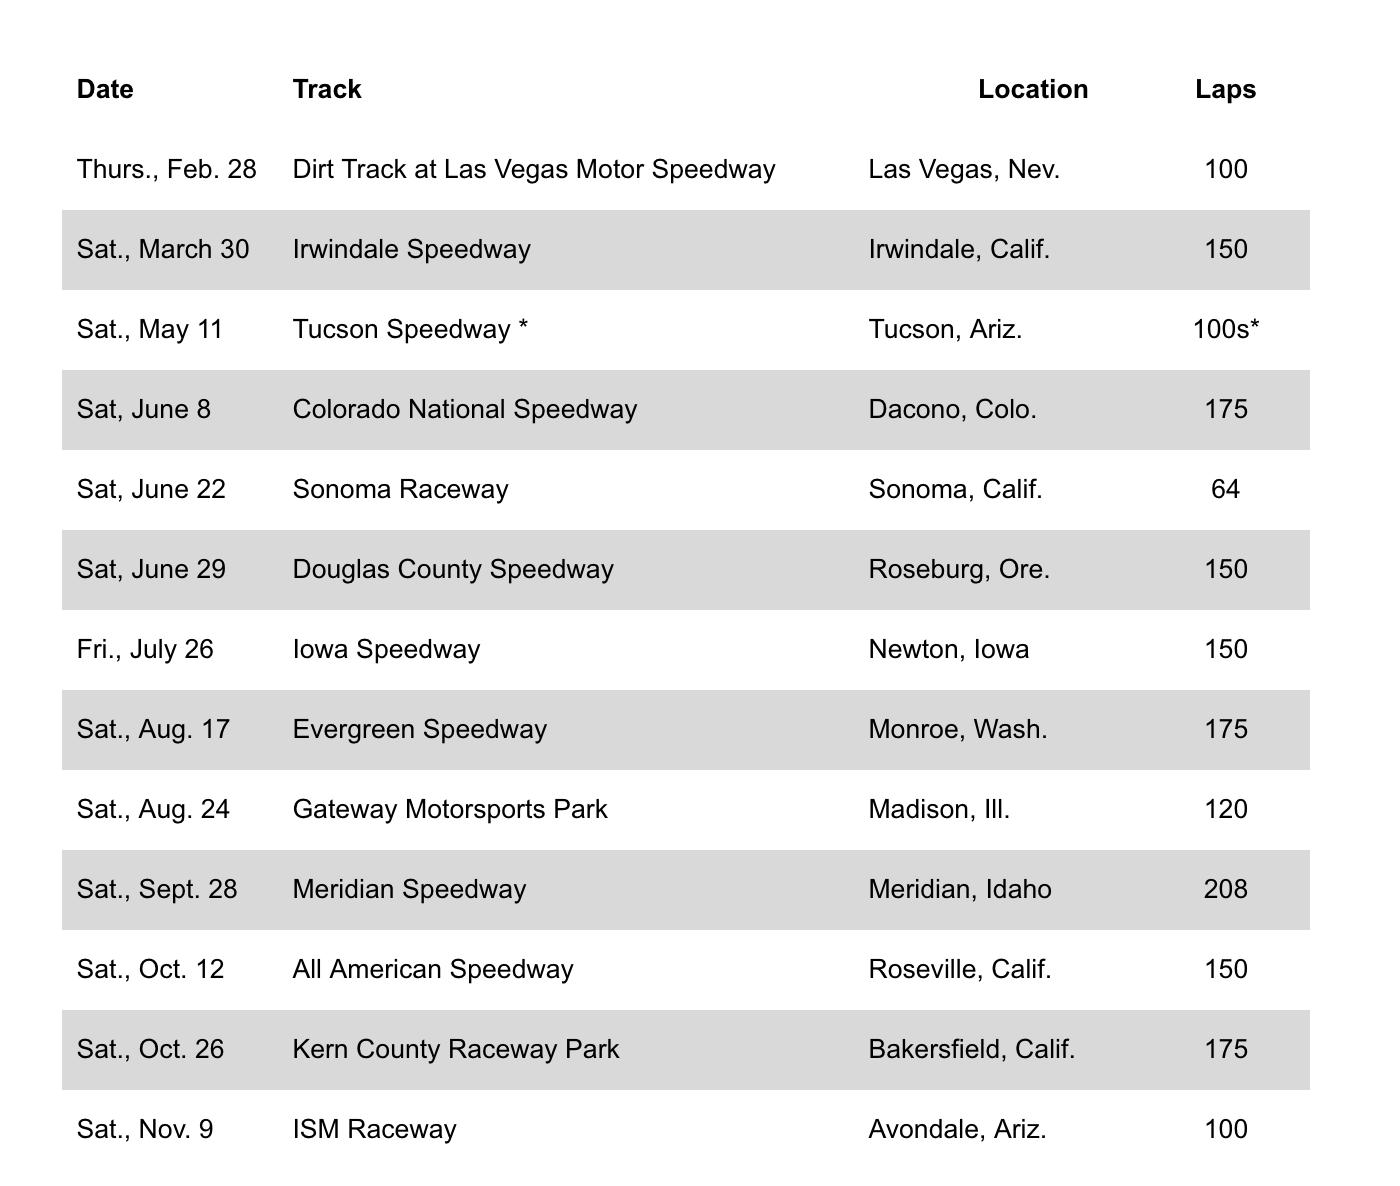 2019 K&N Pro Series West Schedule